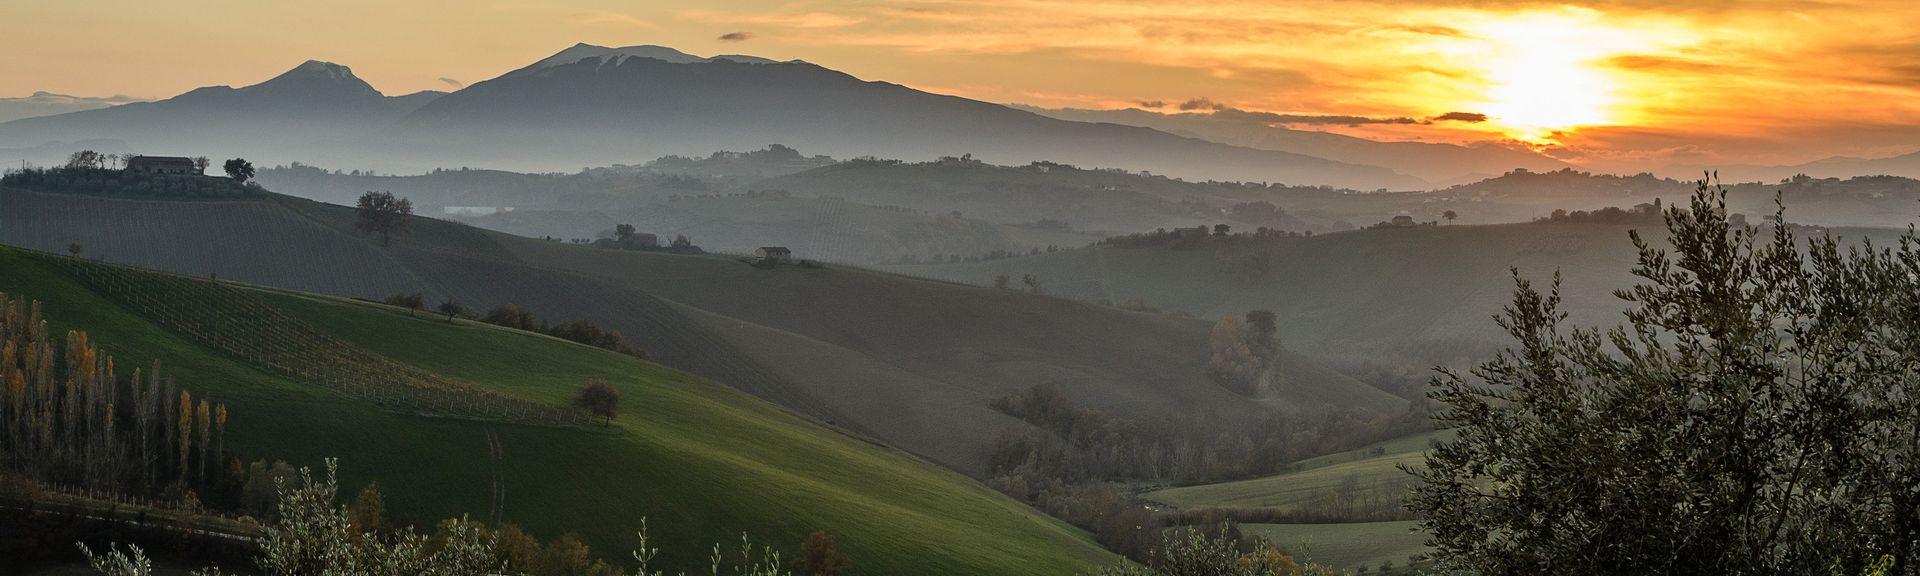 Sant'Omero, Abruzzo, Italy